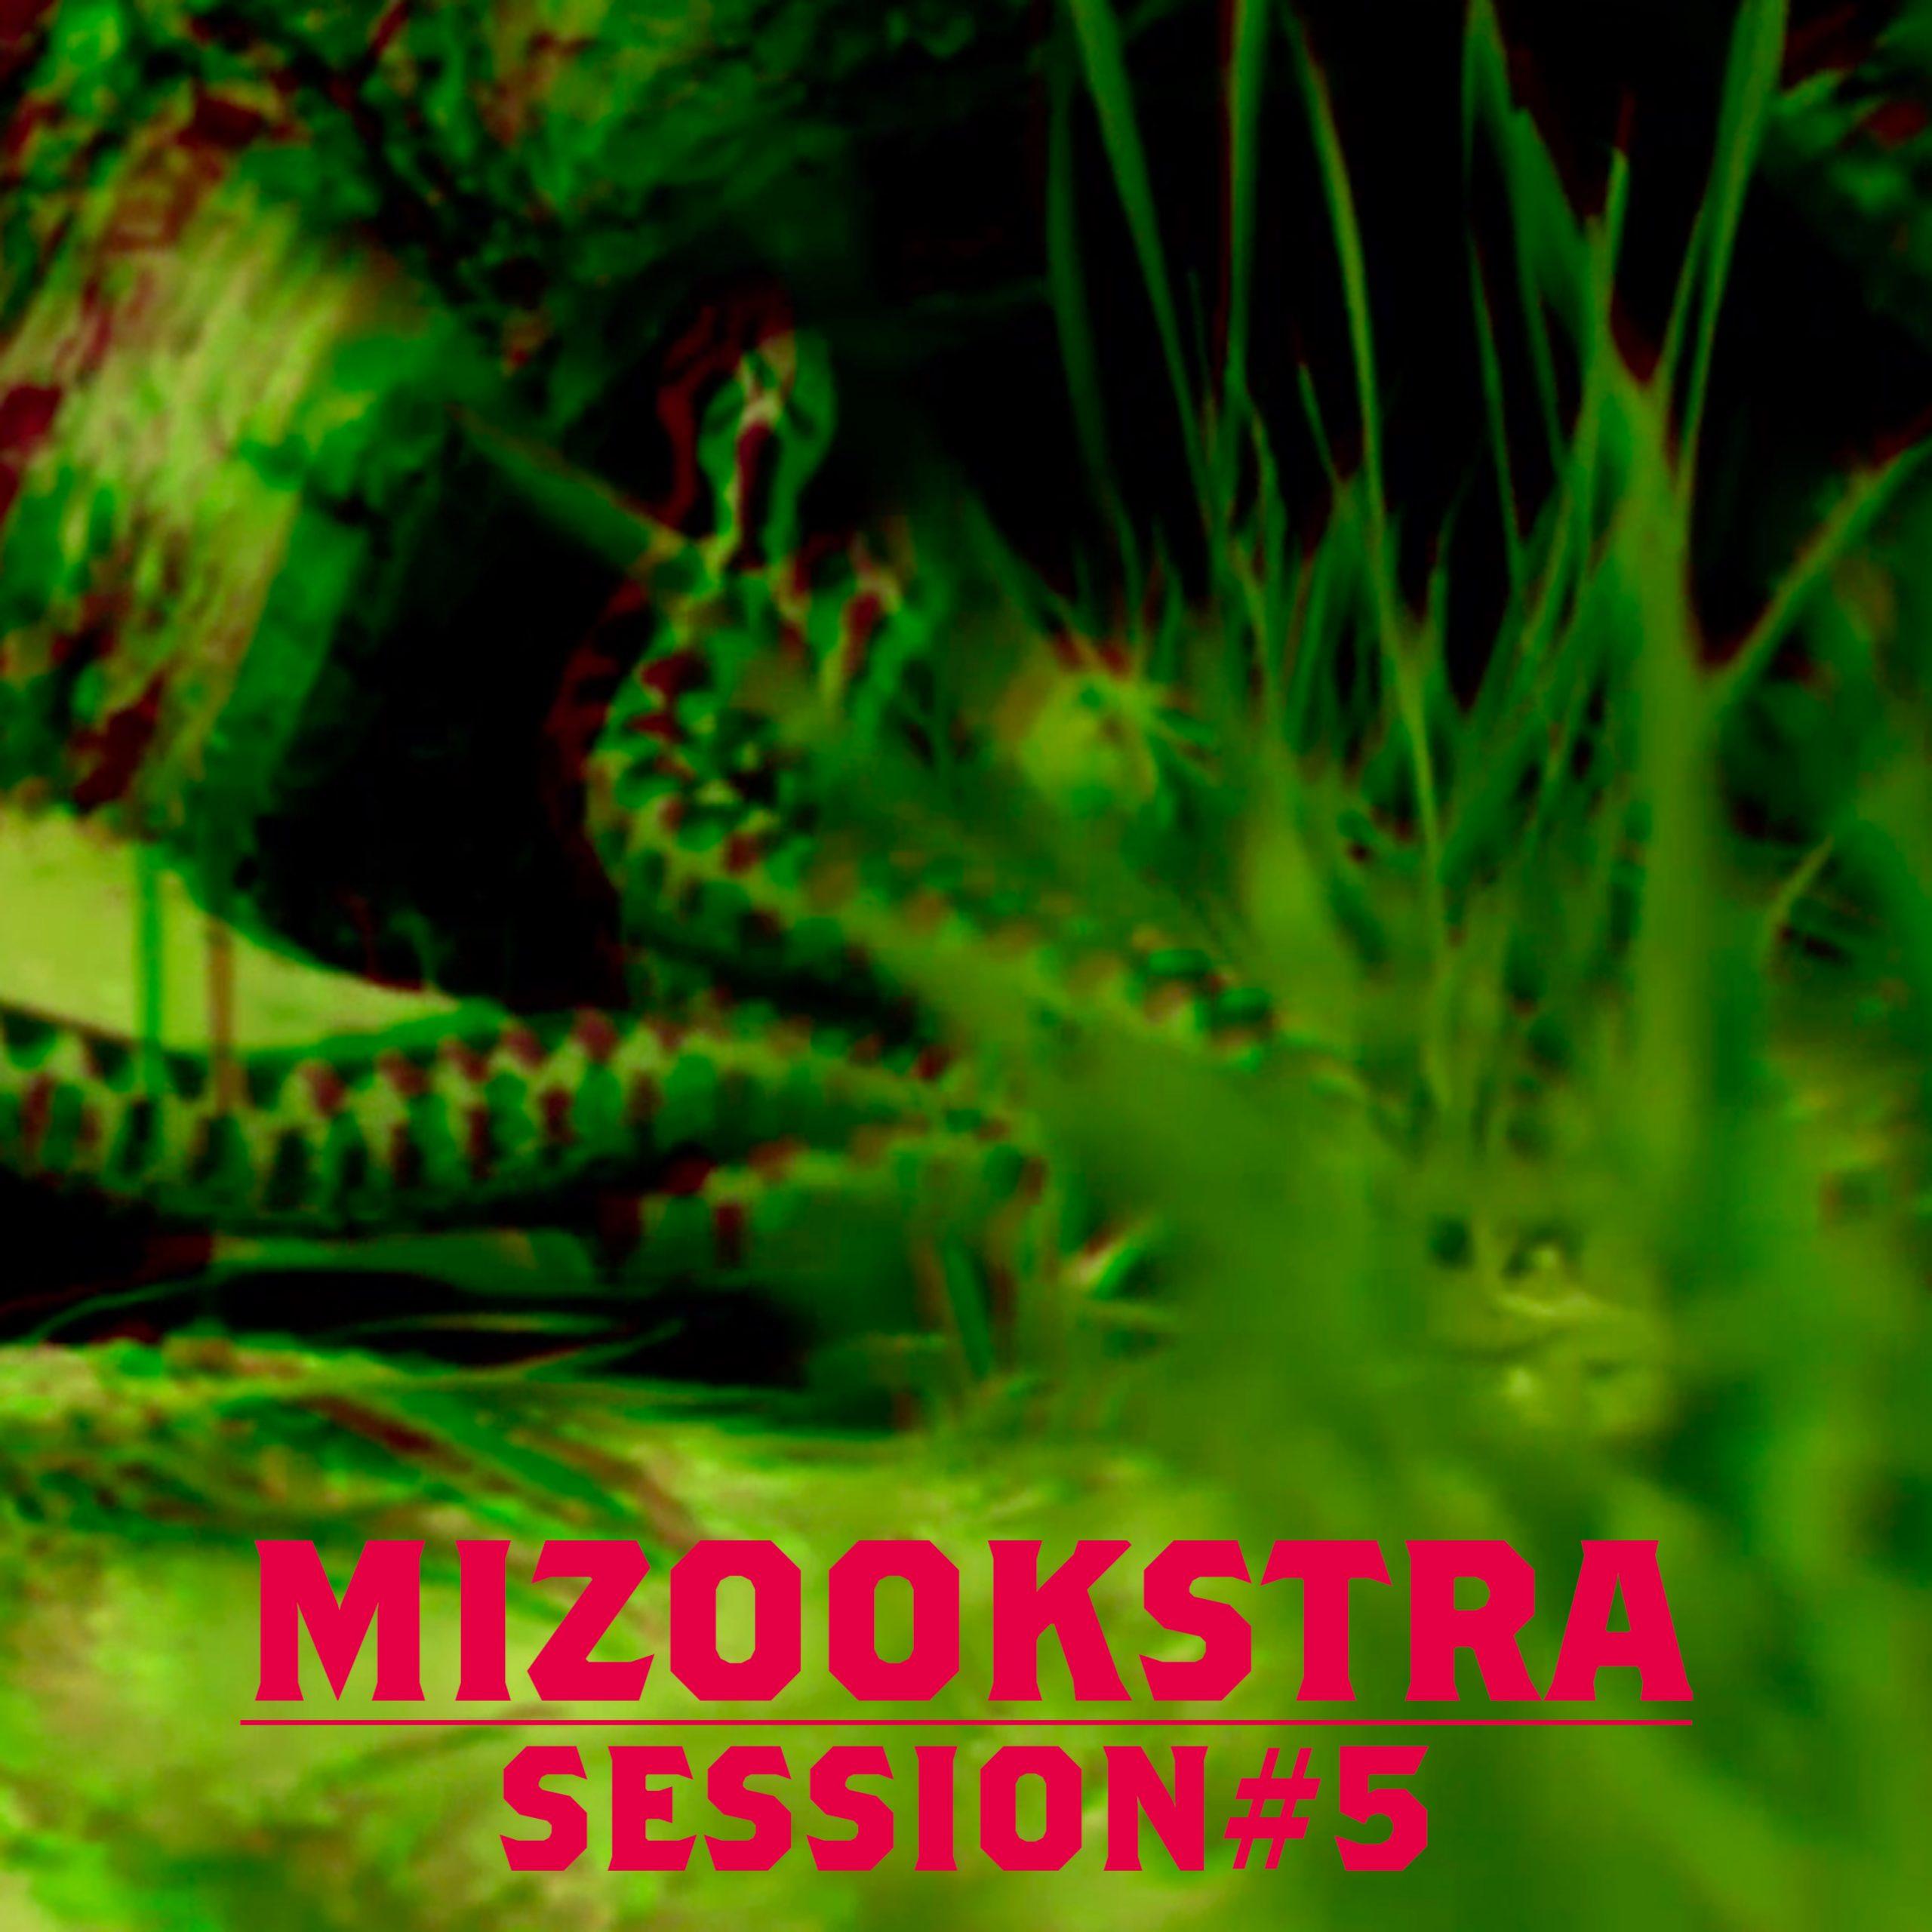 Mizookstra<br/>Session#5<br/>Sangue Disken